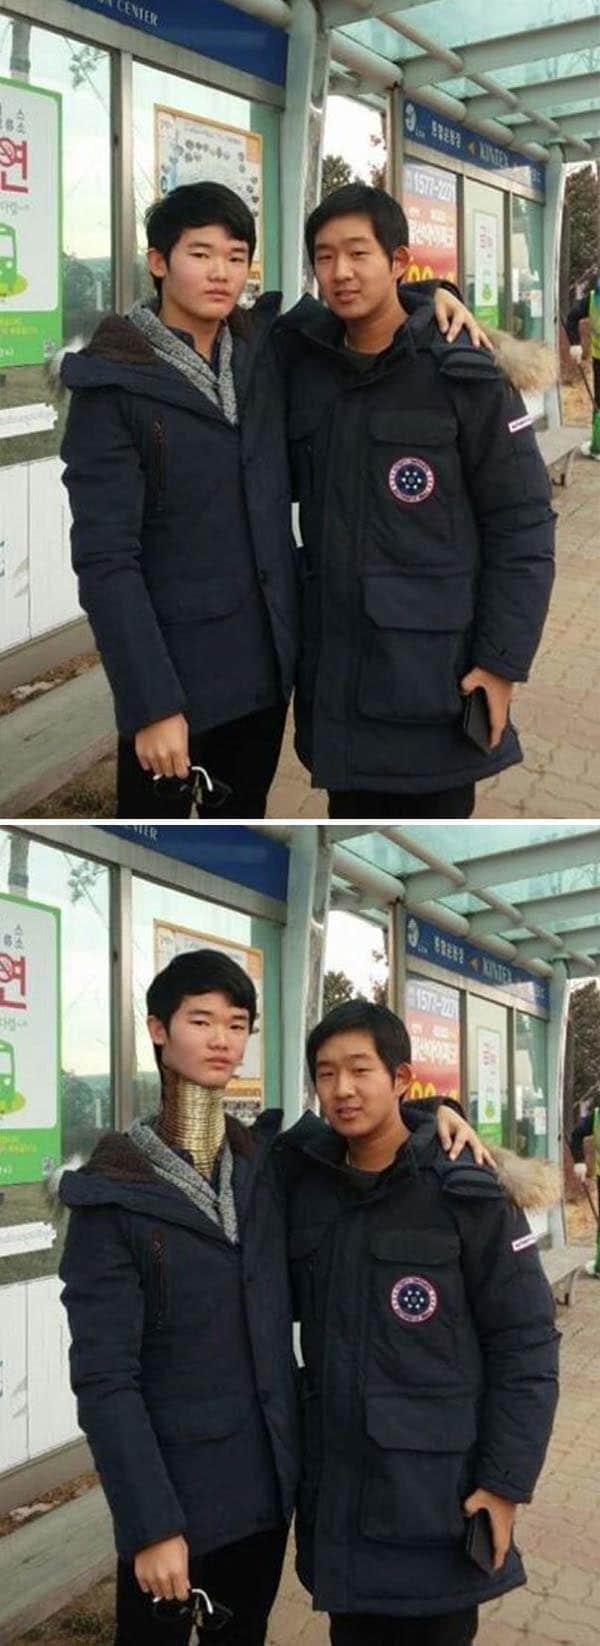 Korean Photoshop Masters make me taller than my friend